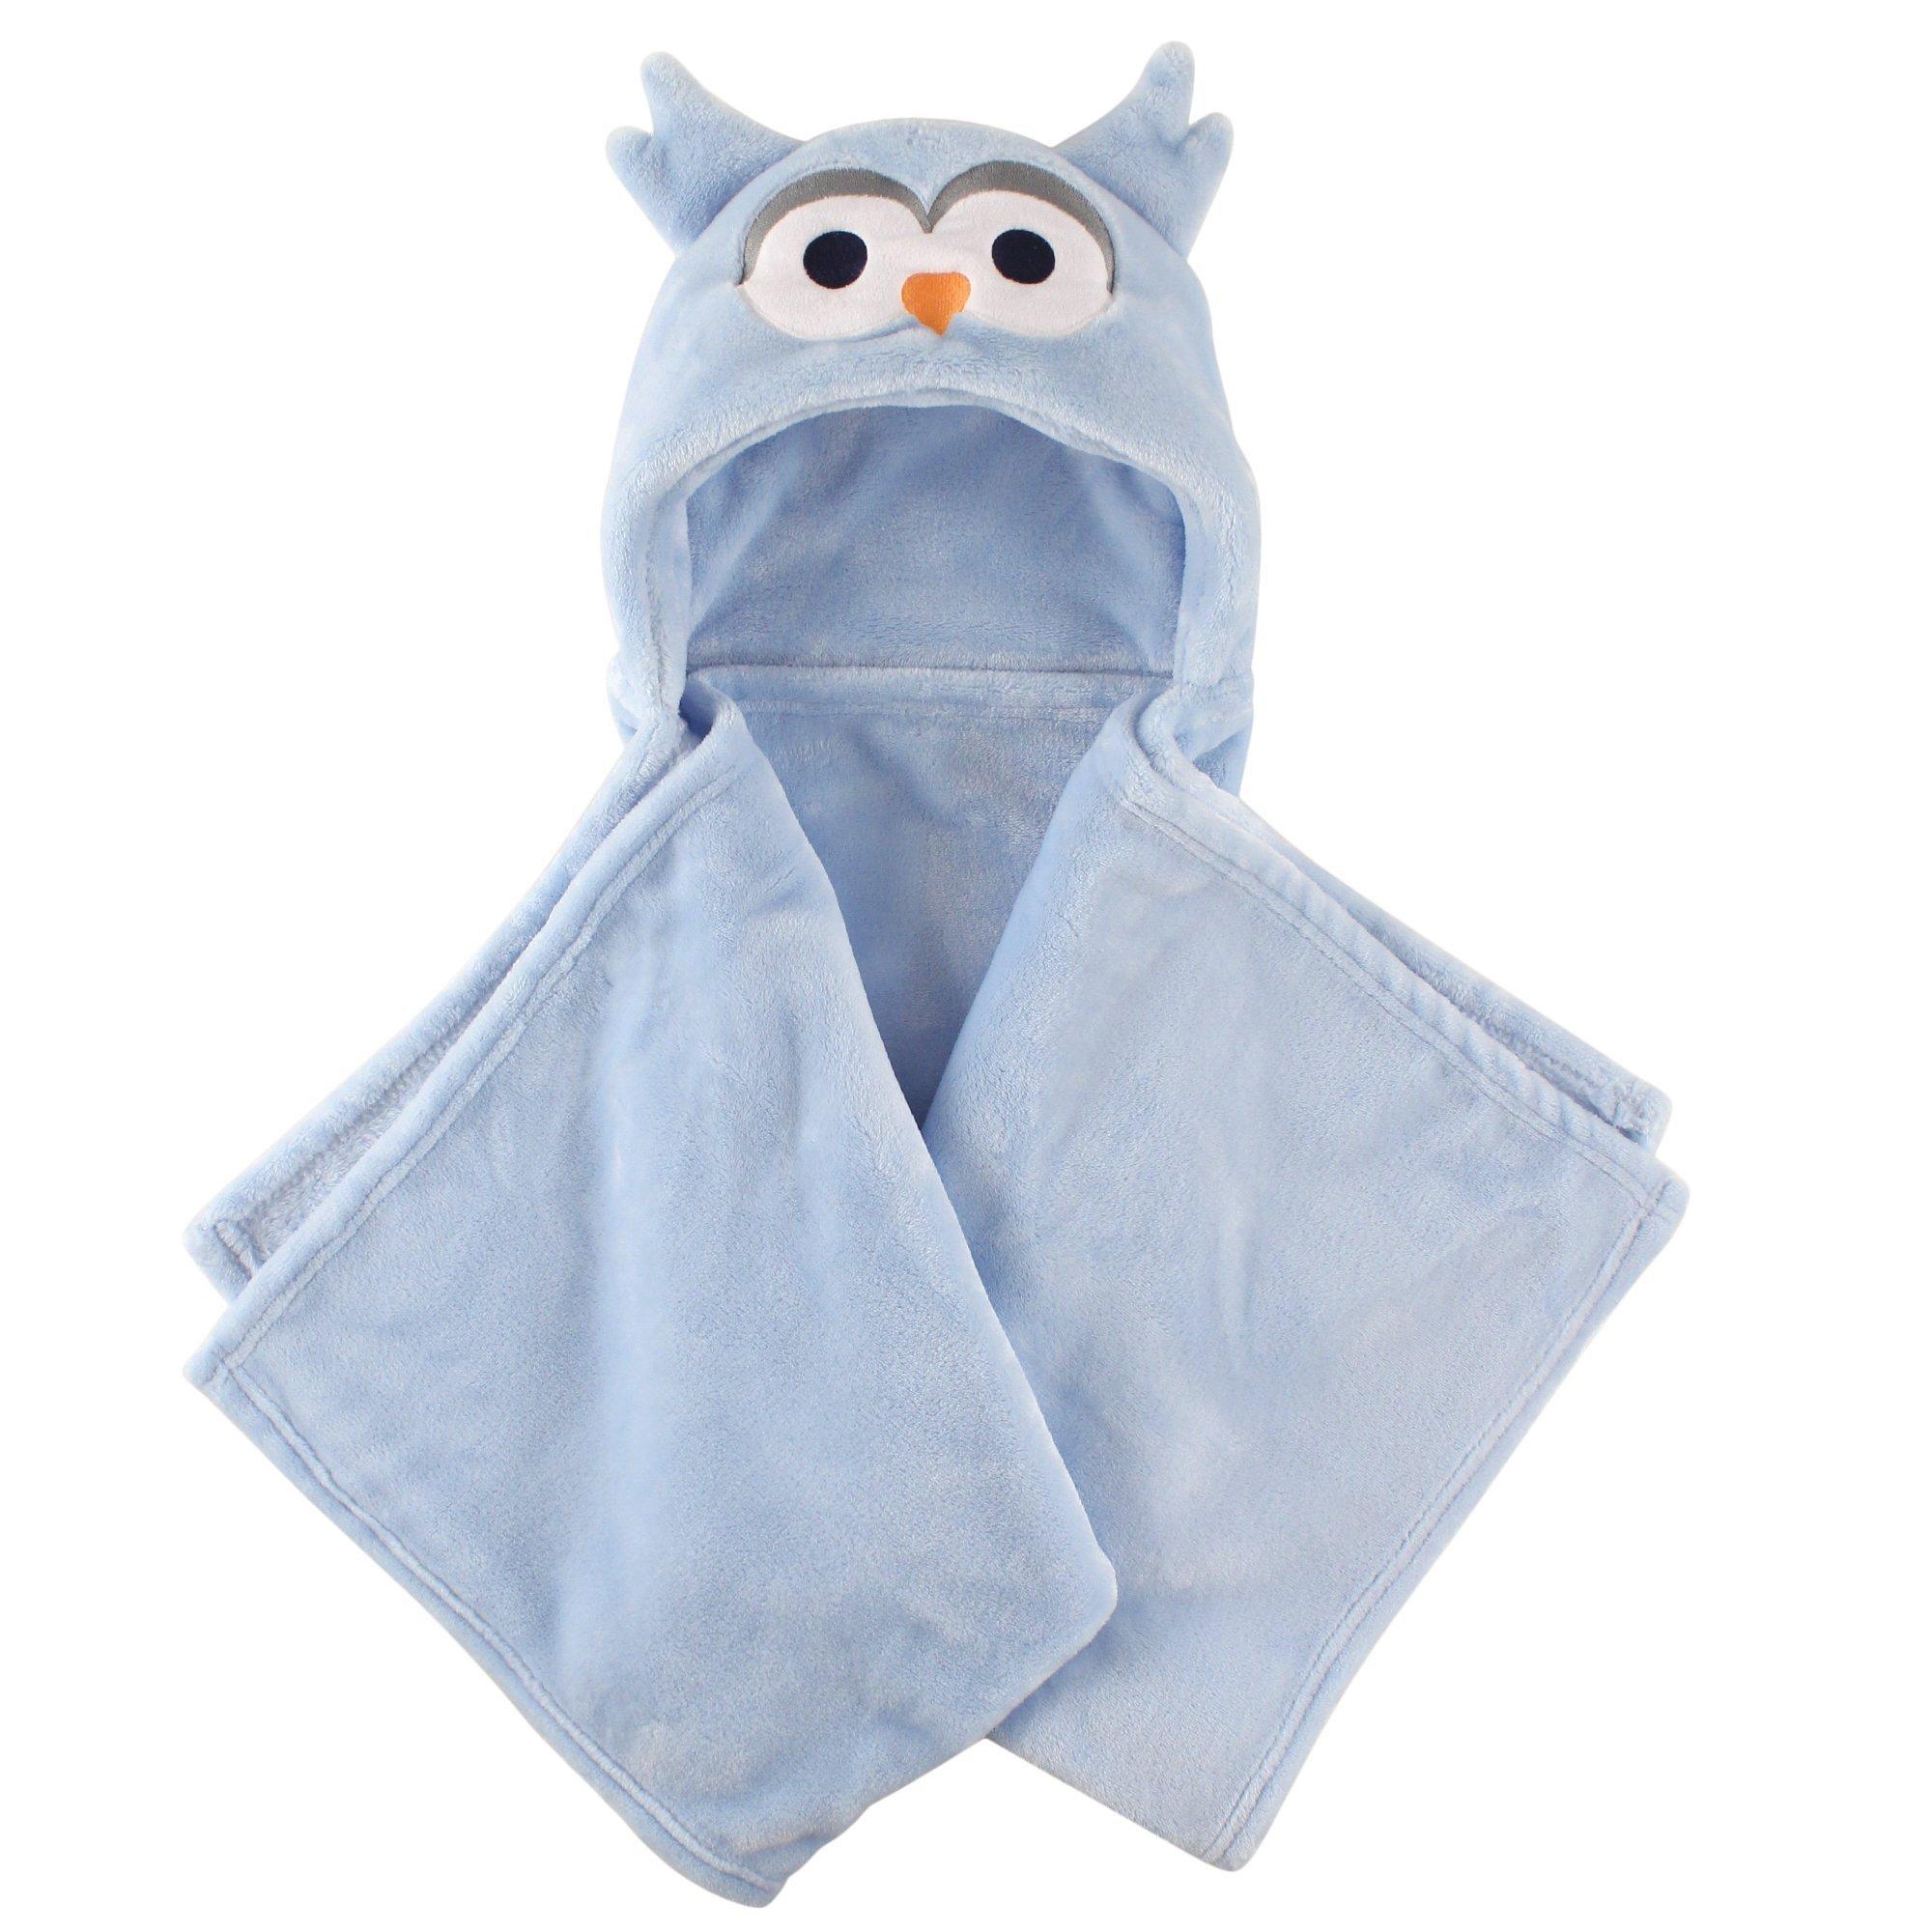 Hudson Baby Unisex Baby and Toddler Hooded Animal Face Plush Blanket, Blue Owl, One Size